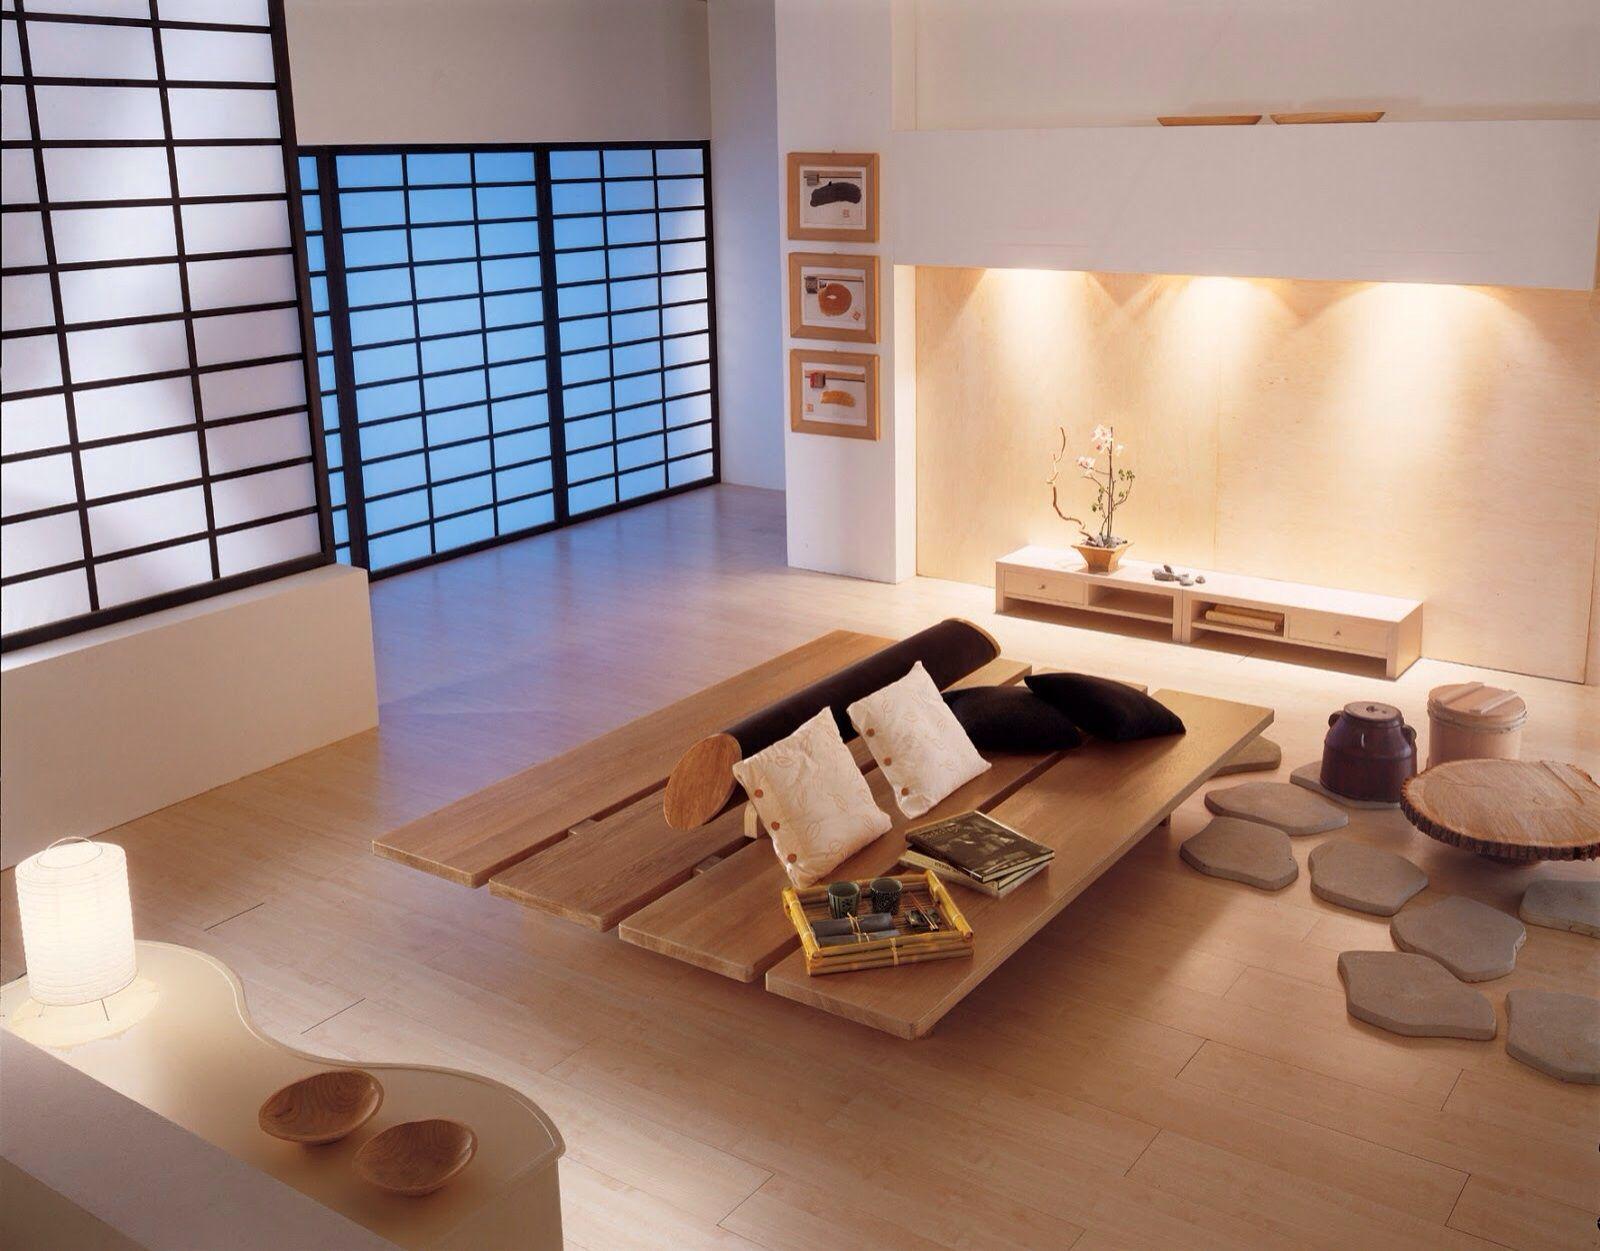 Dise Os 15 Interior Corea Moderna Tradicional Minimalista  # Muebles Estilo Budista